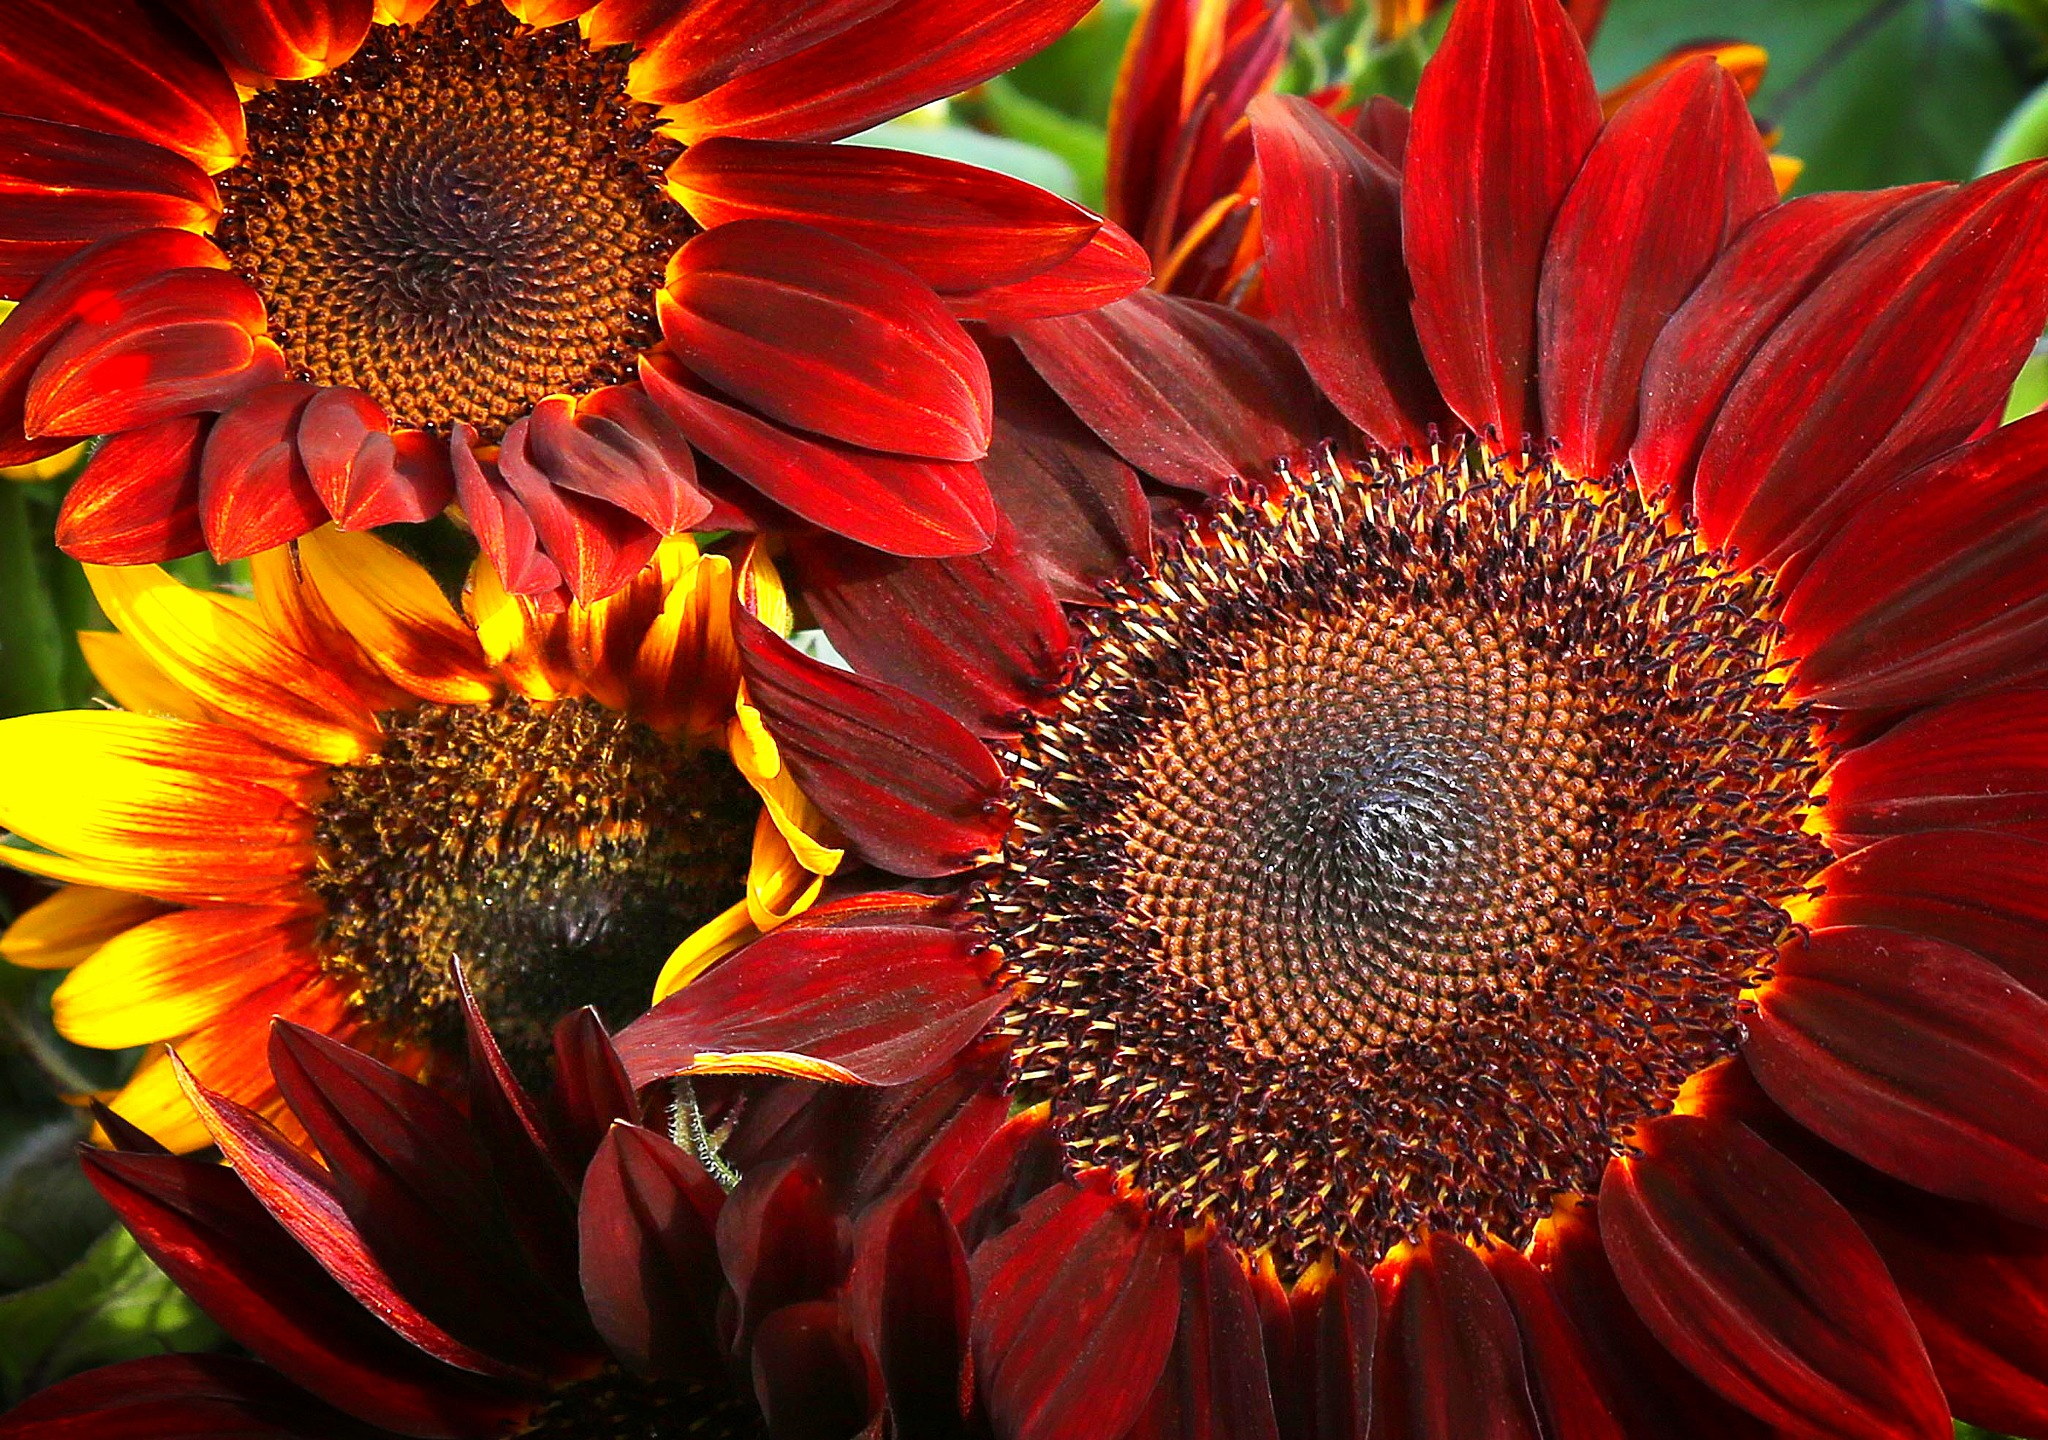 Sunflowers  by acason34